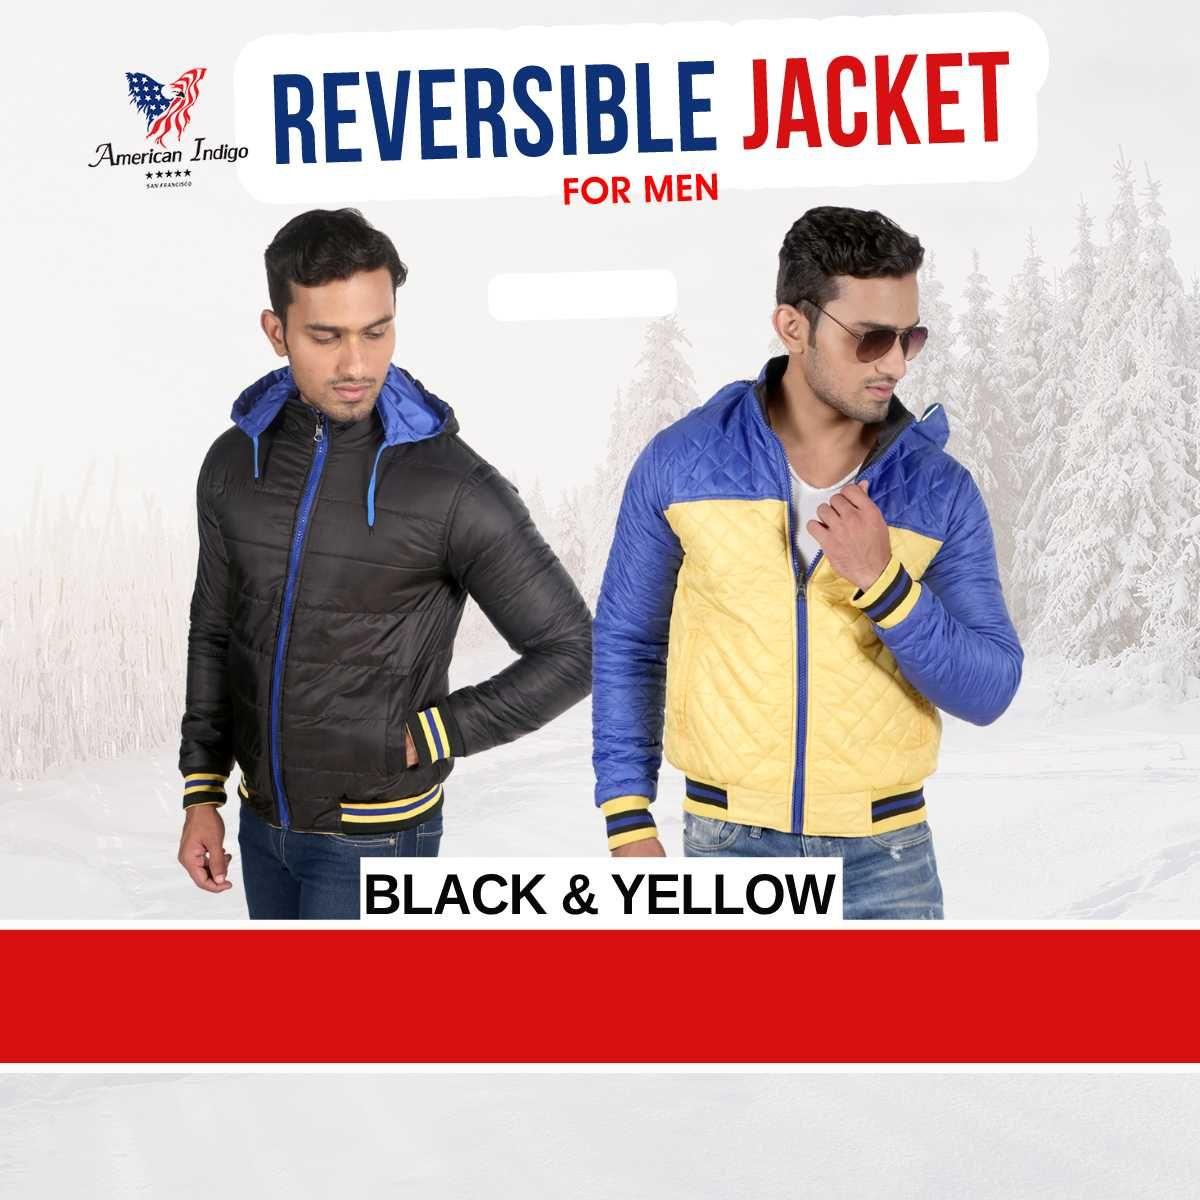 Buy American Indigo Reversible Jacket For Men Black Yellow